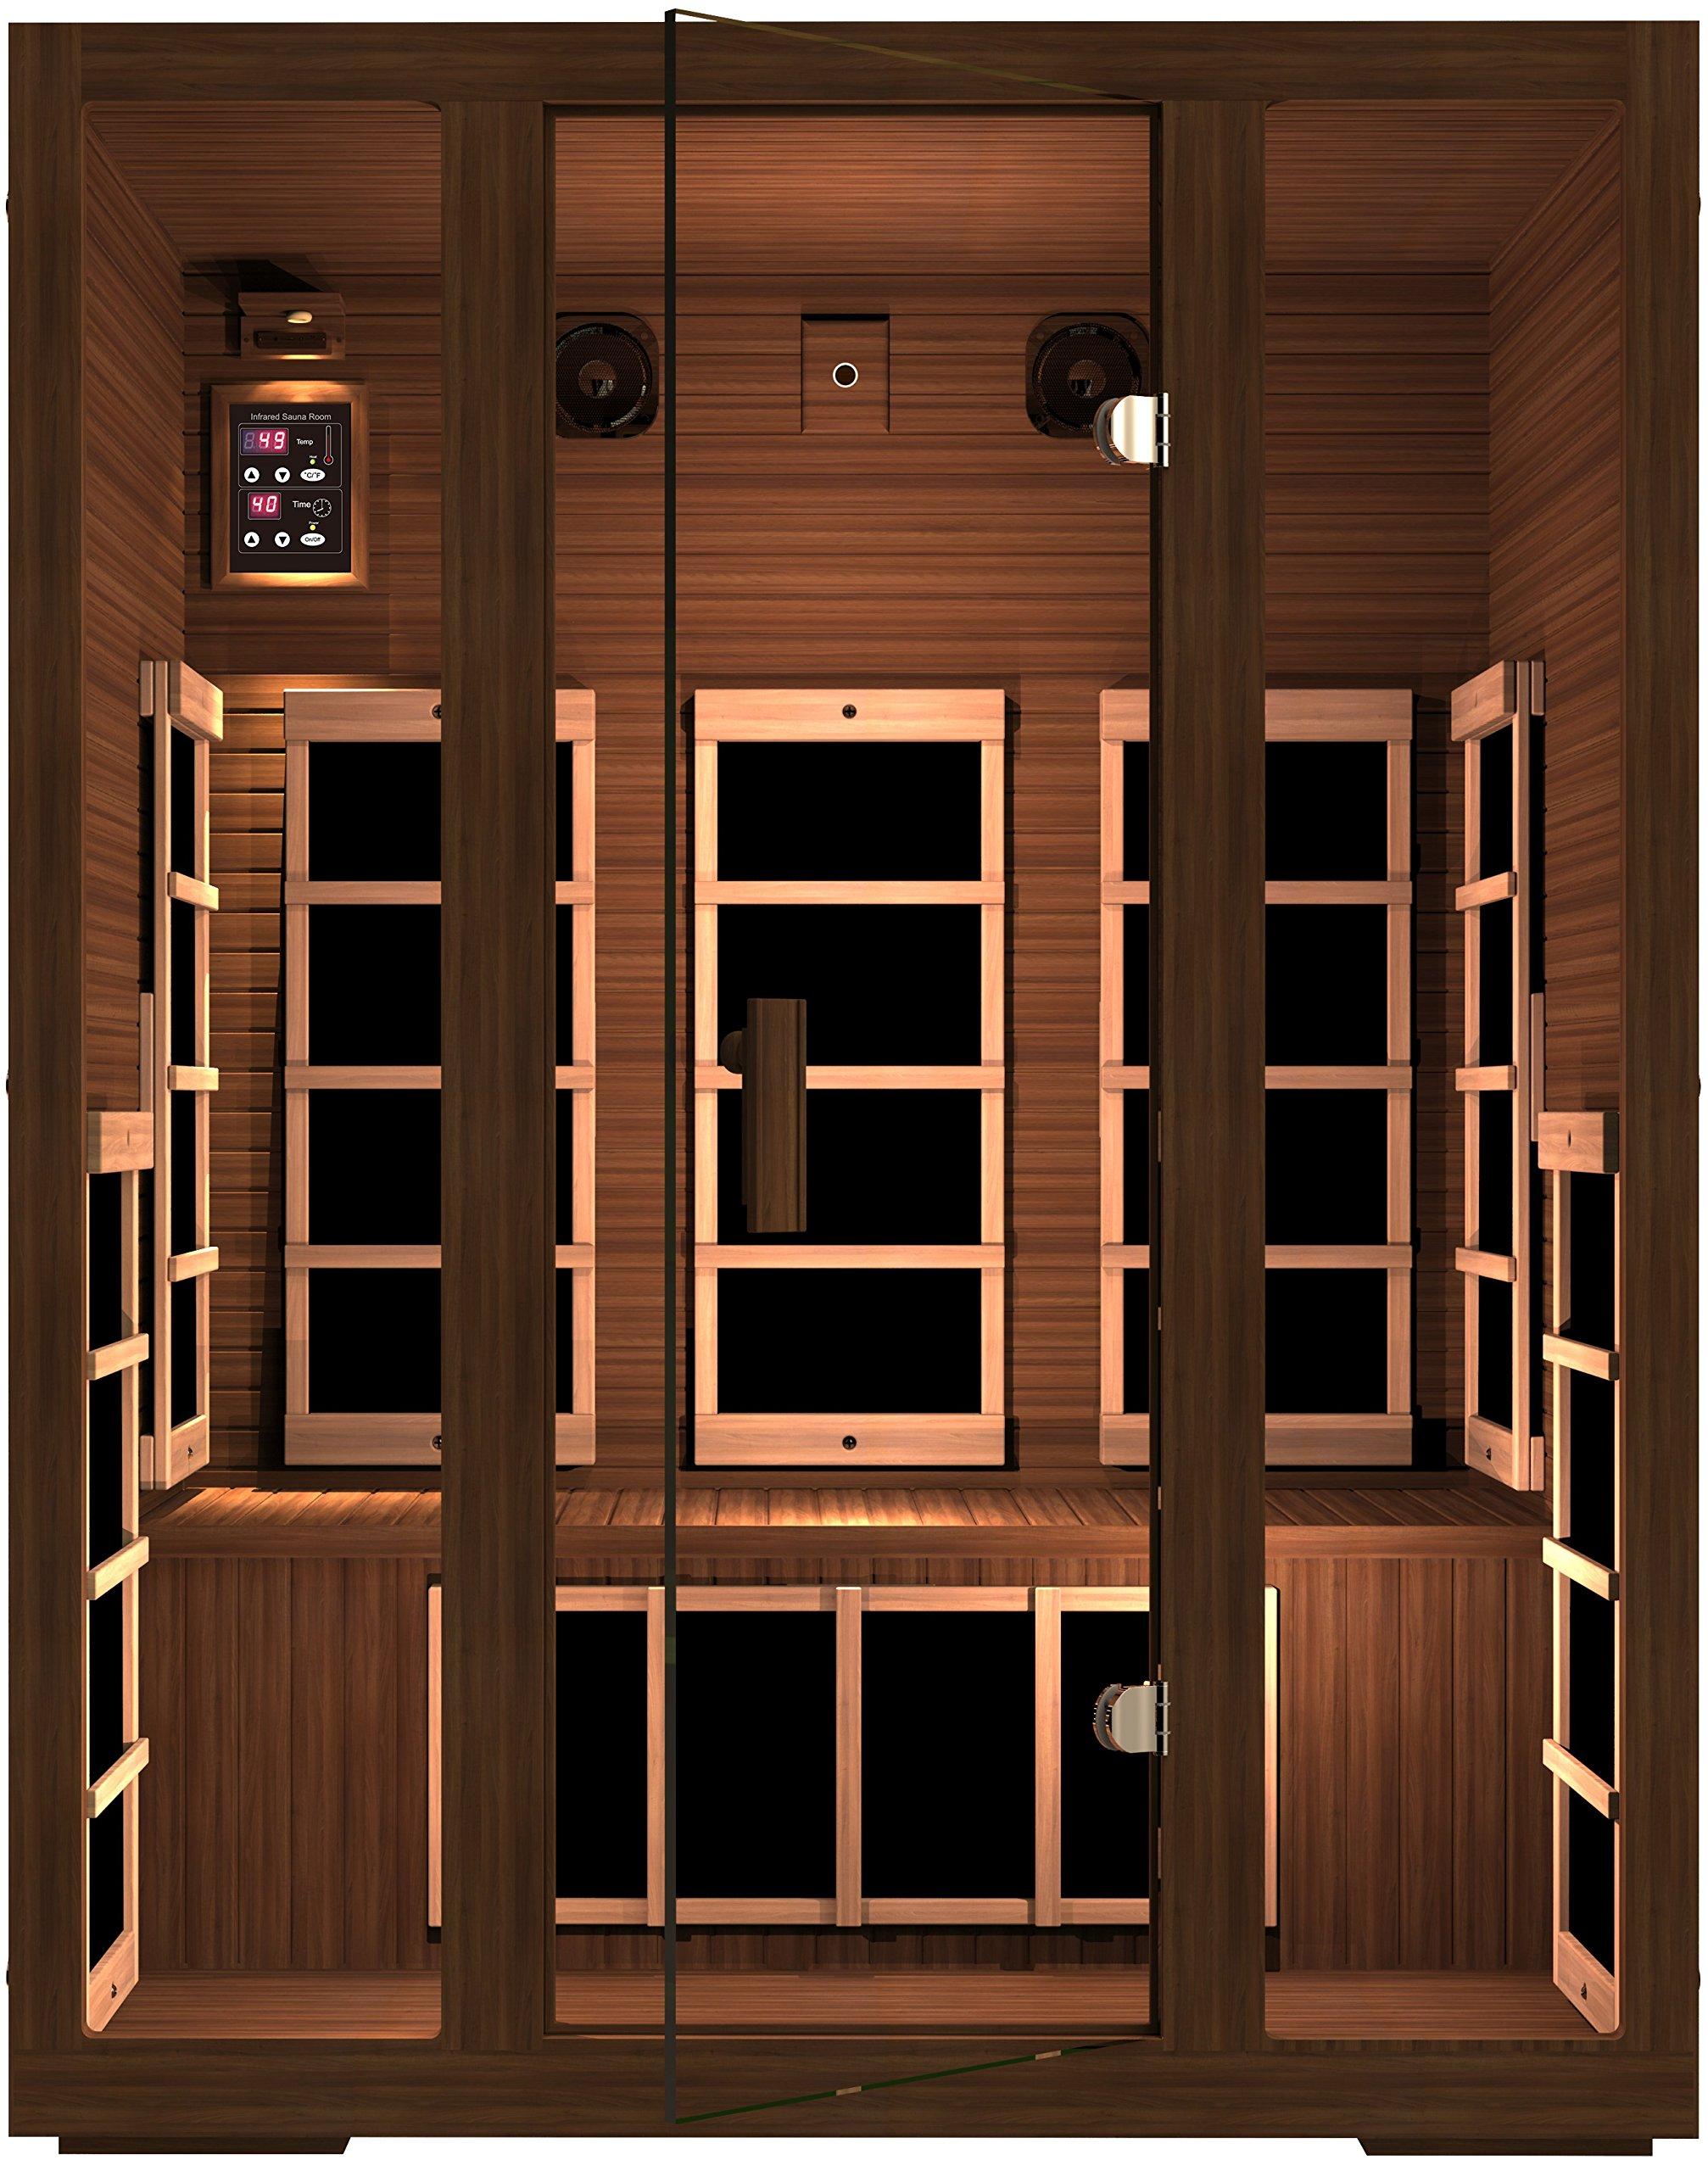 JNH Lifestyles Freedom 3 Person Canadian Western Red Cedar Wood Far Infrared Sauna, 8 Carbon Fiber Heaters, 5 Year Warranty